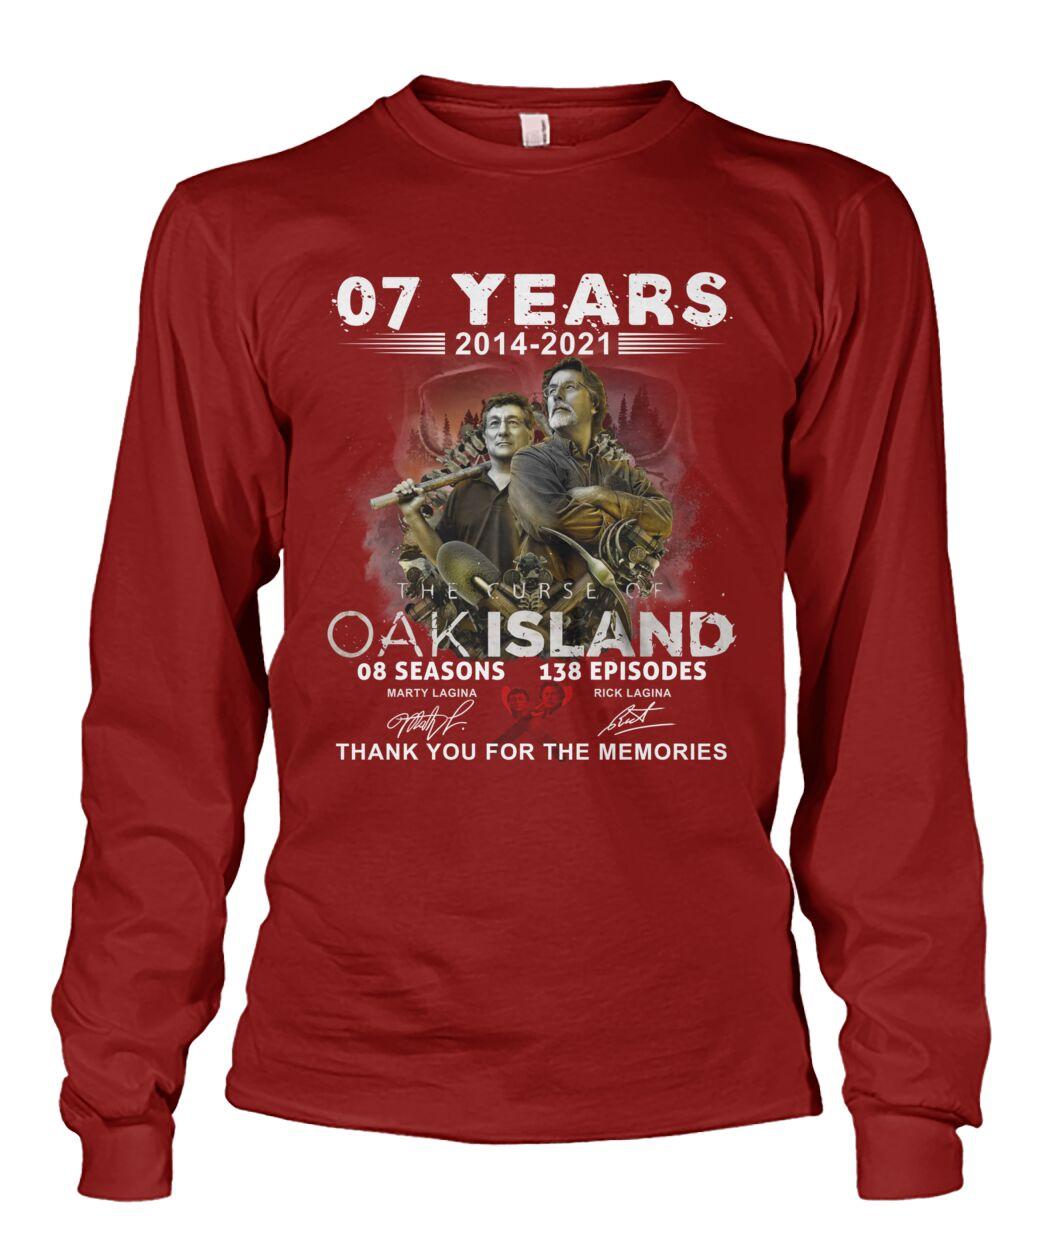 07 years 2014 2021 OAK island 08 seasons thank you for memories shirt 12